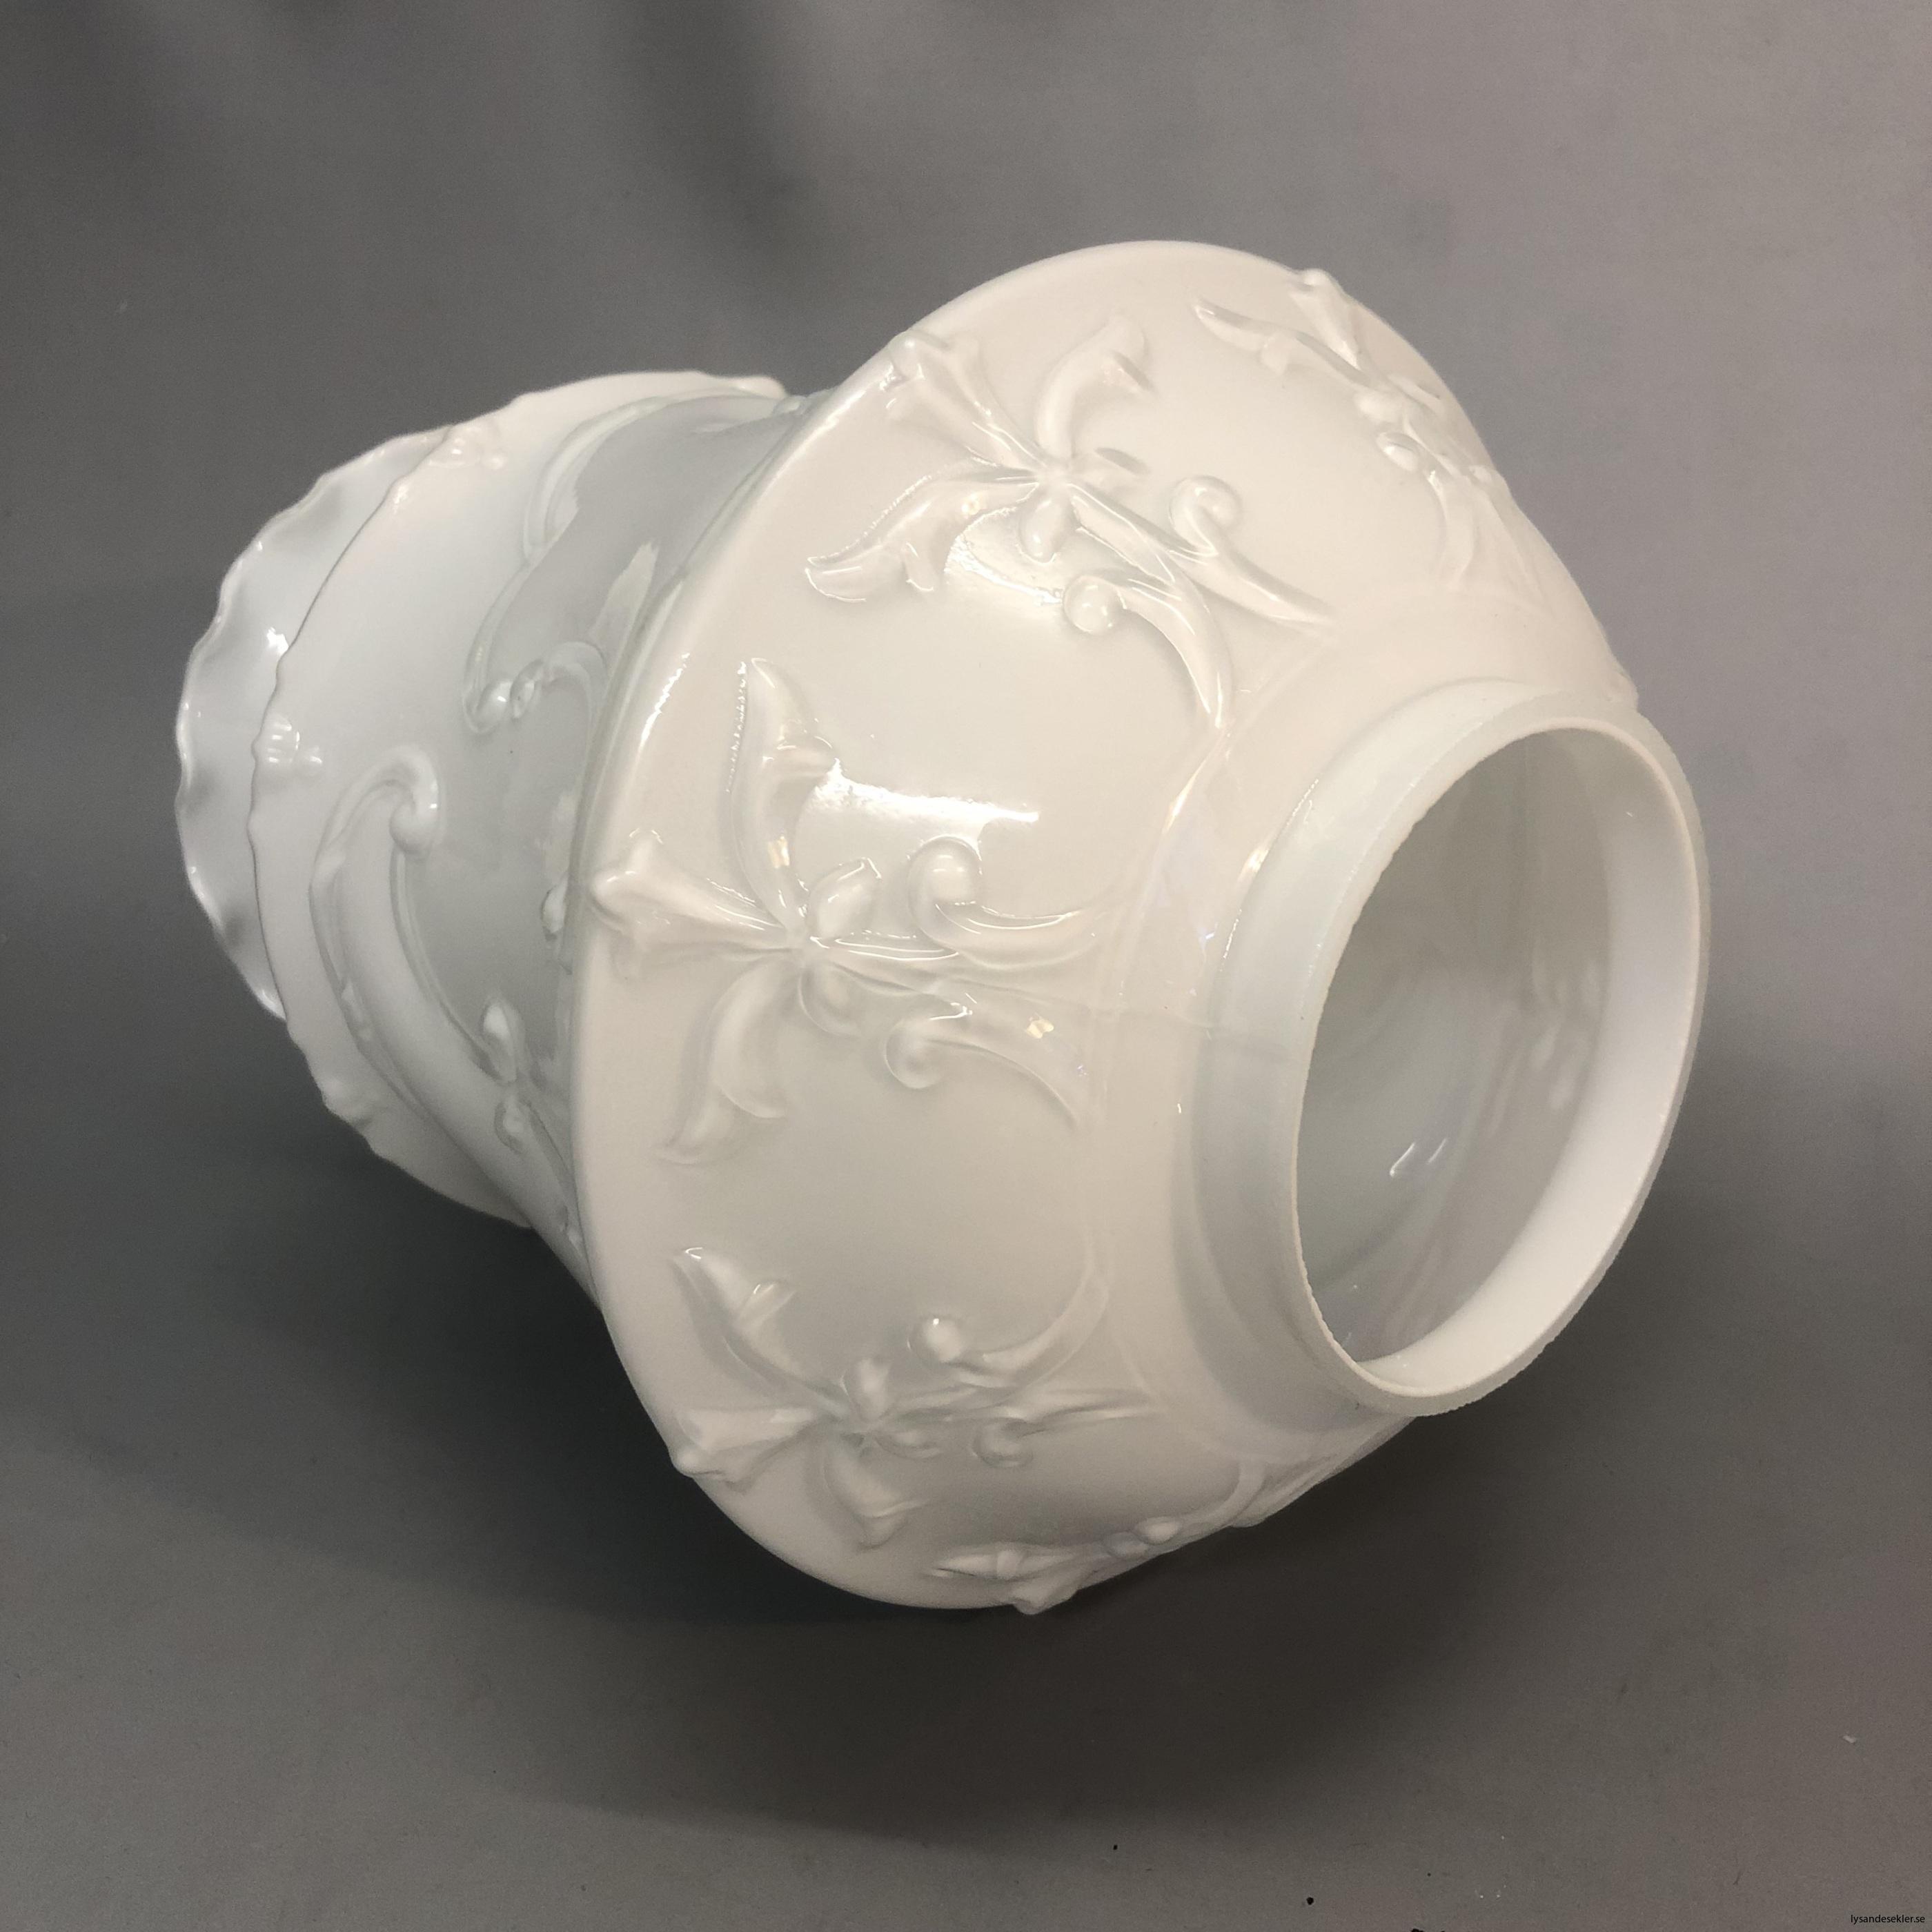 fotogenlampskupa kupa till fotogenlampa tulipan tulpan tulpankupor kupor11